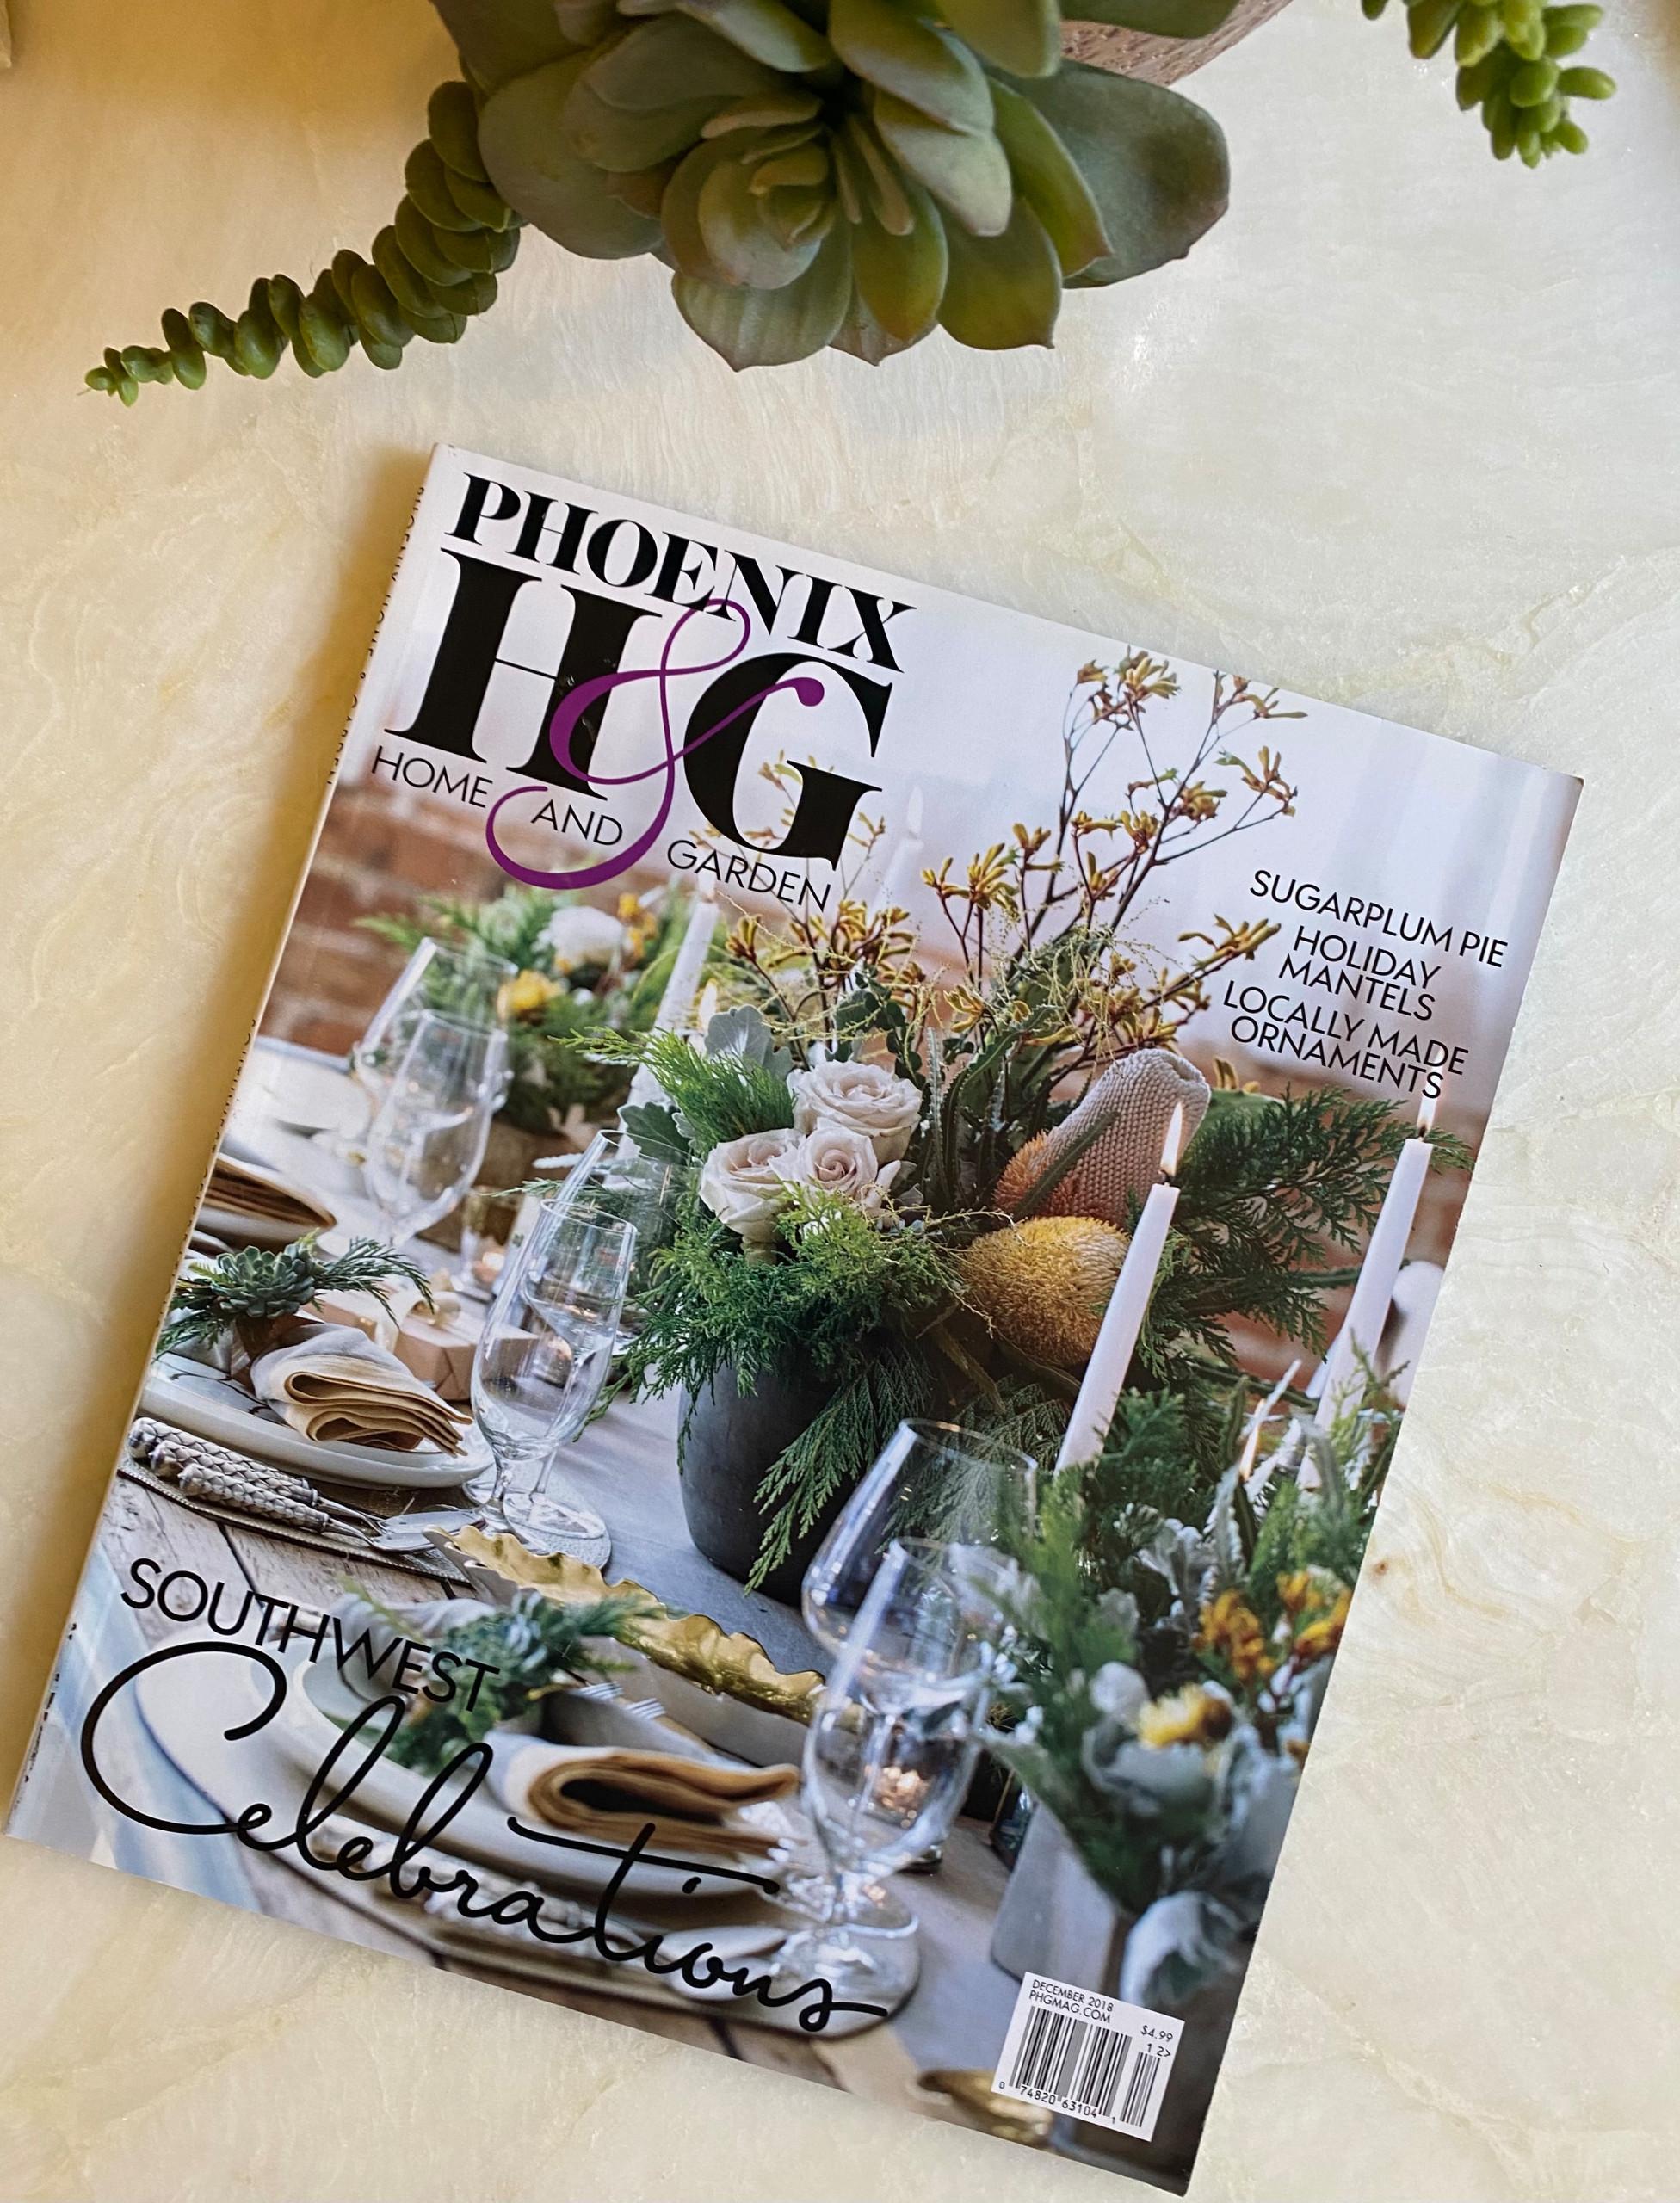 Phoenix Home and Garden Feature